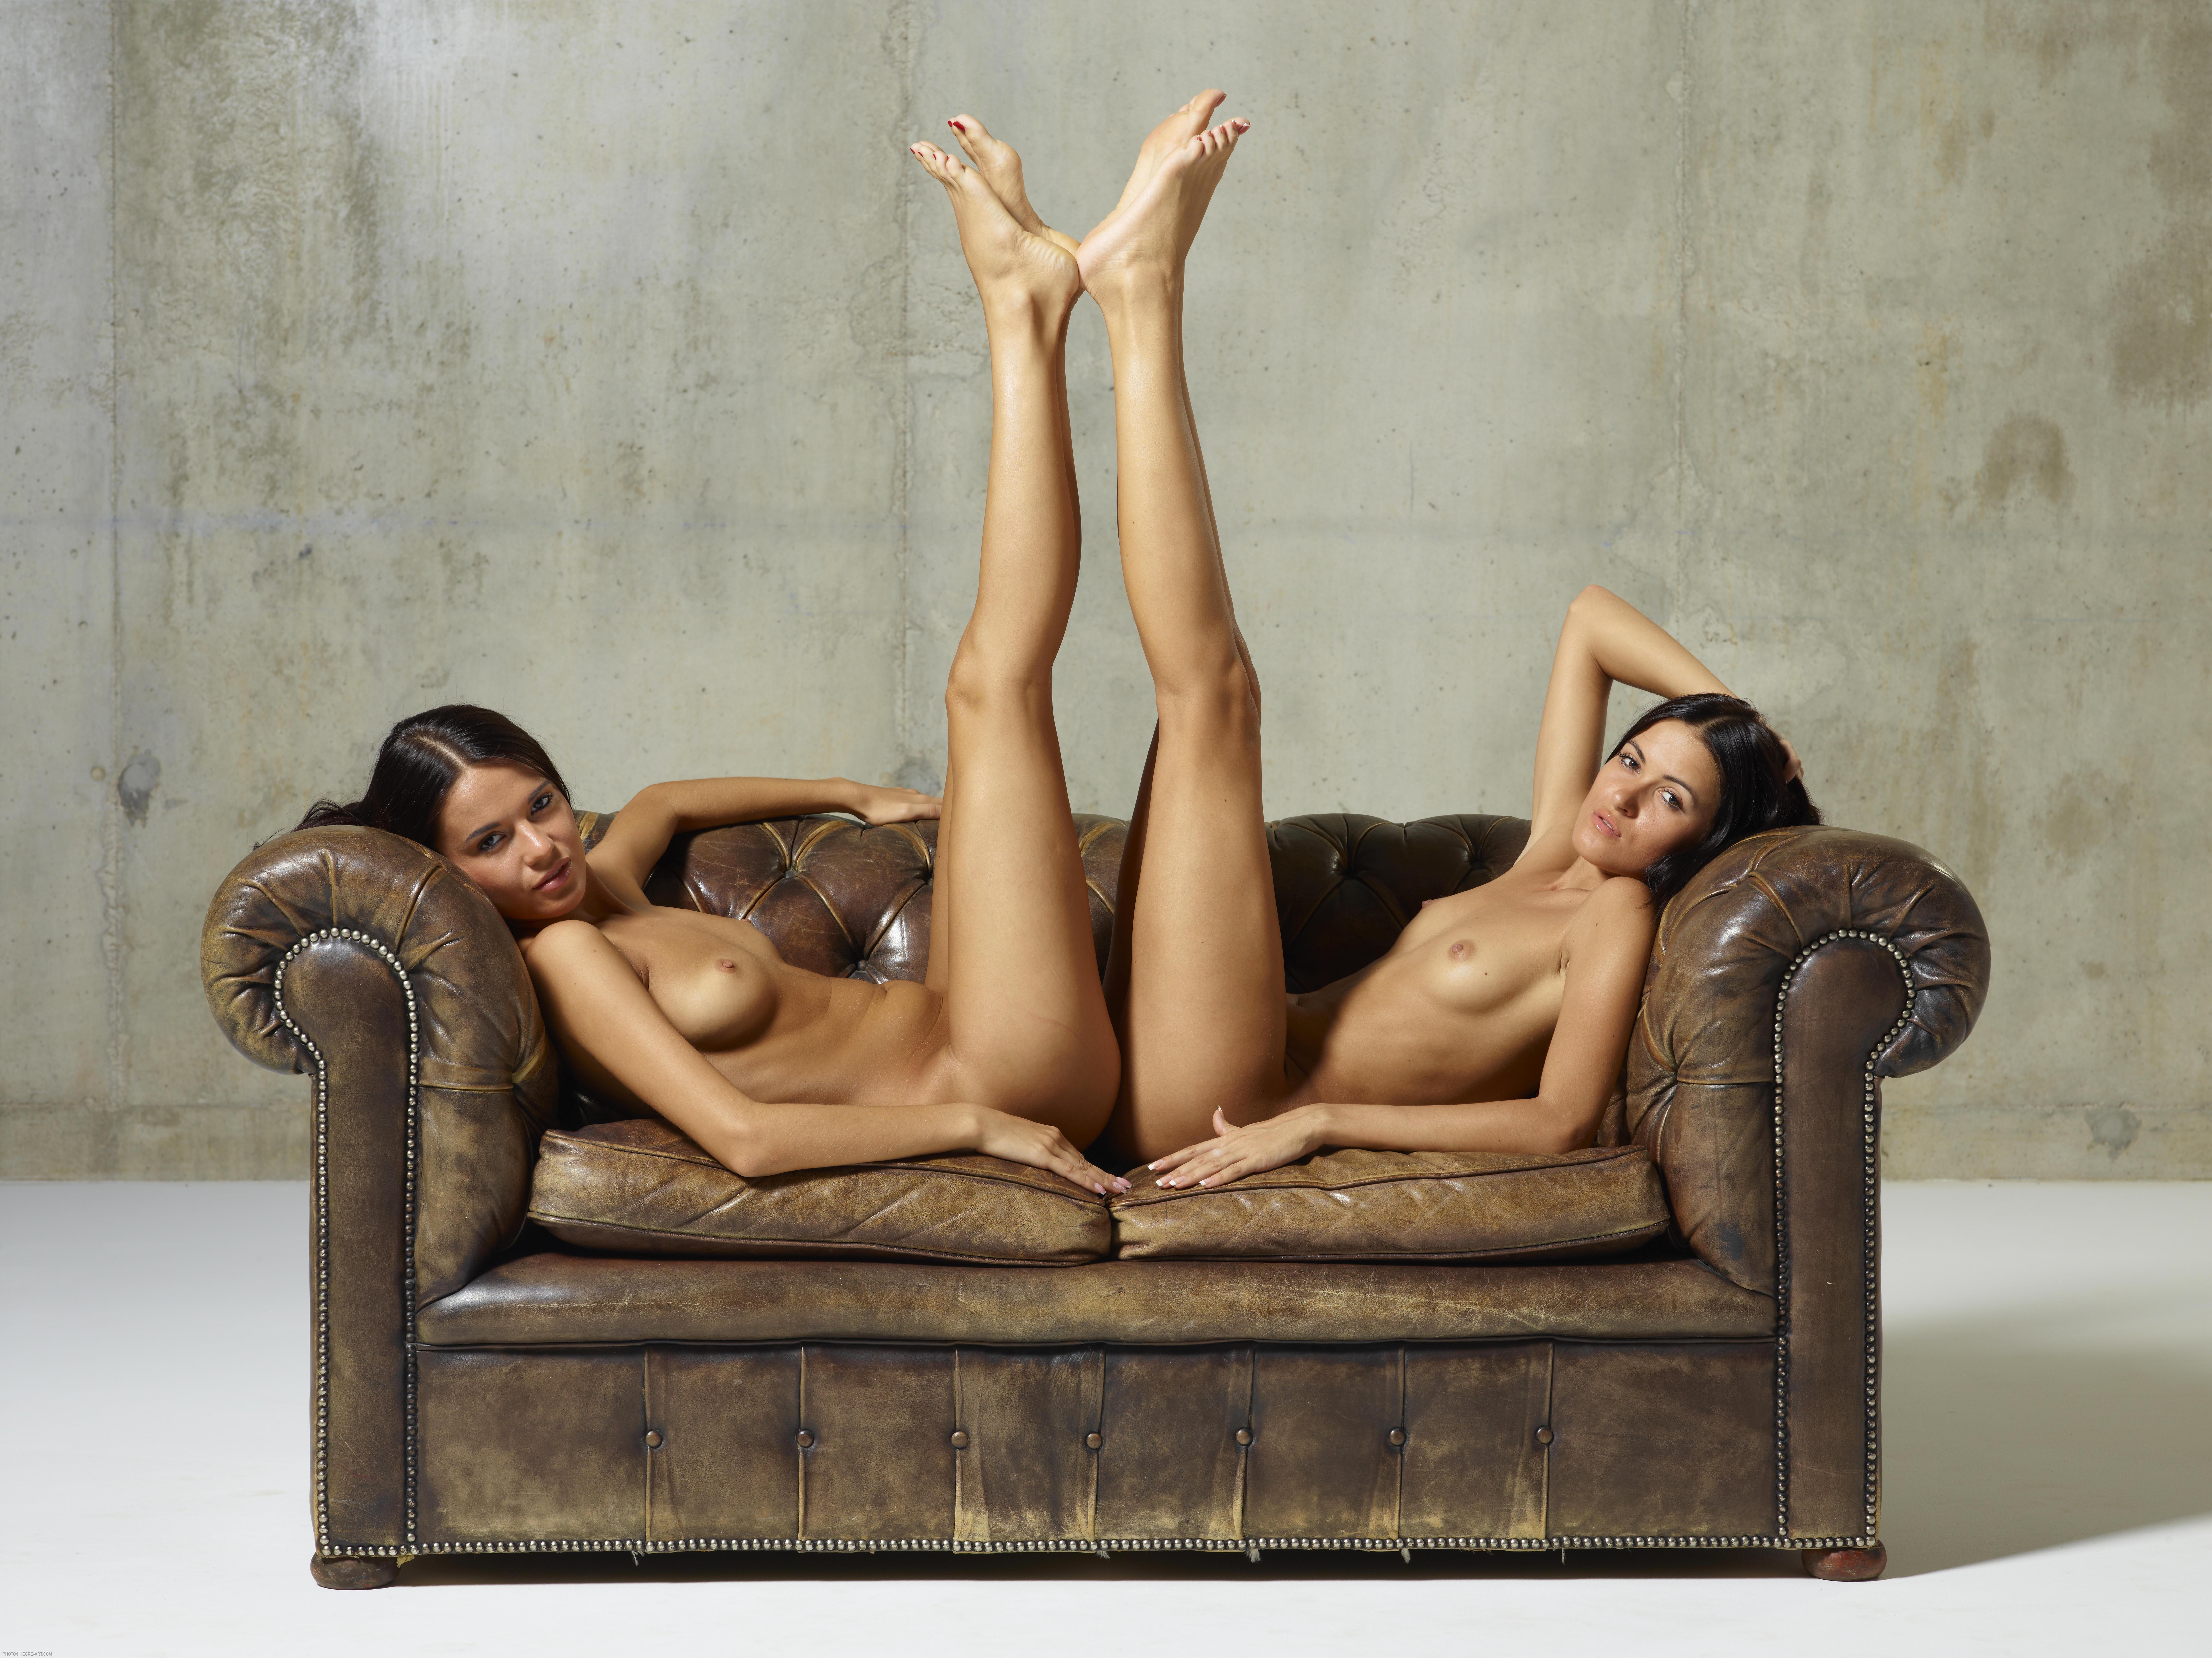 watch my girlfriend naked sex